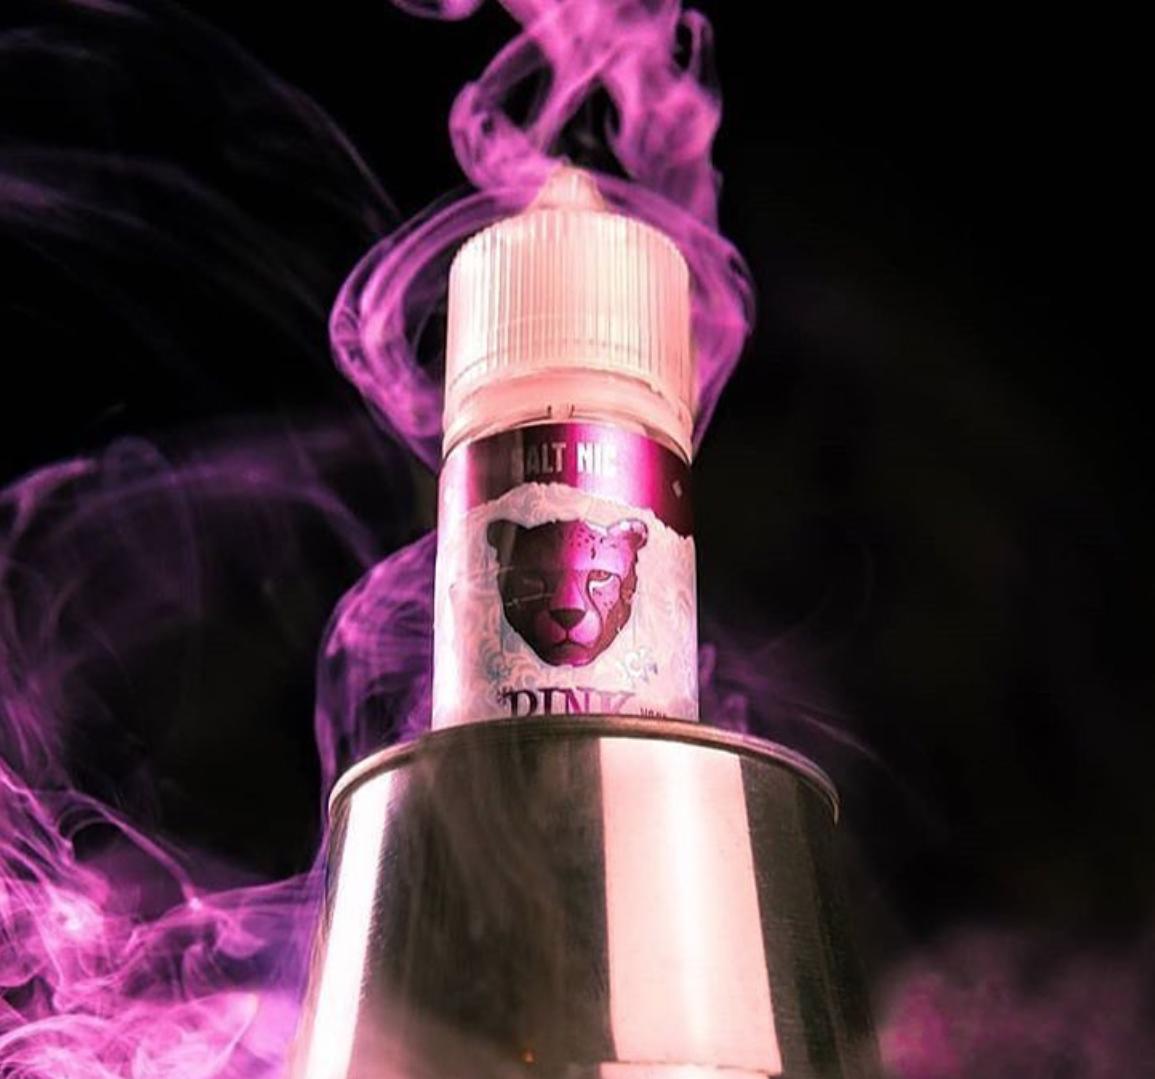 Panther Series - Pink Ice Salt Nicotine بينك باردة نيكوتين ملحي